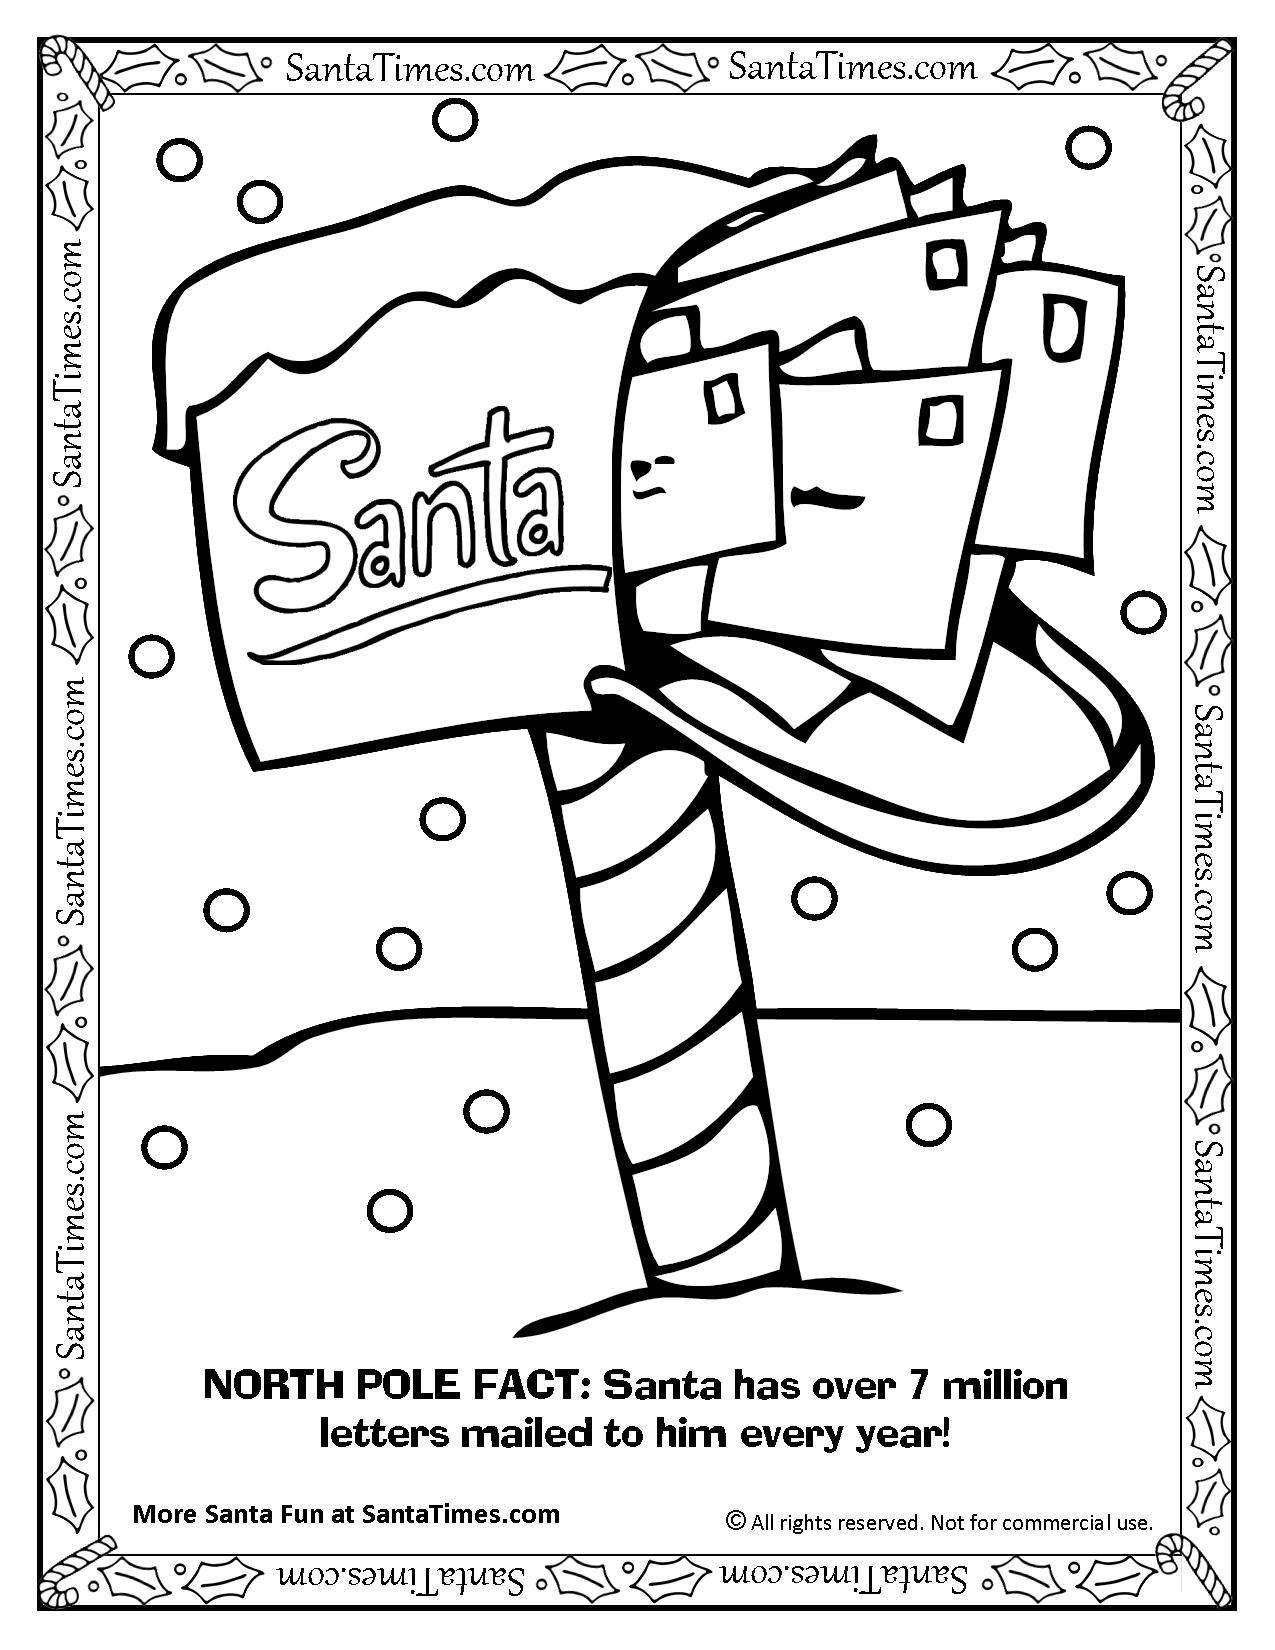 Mailbox Of Santa Claus